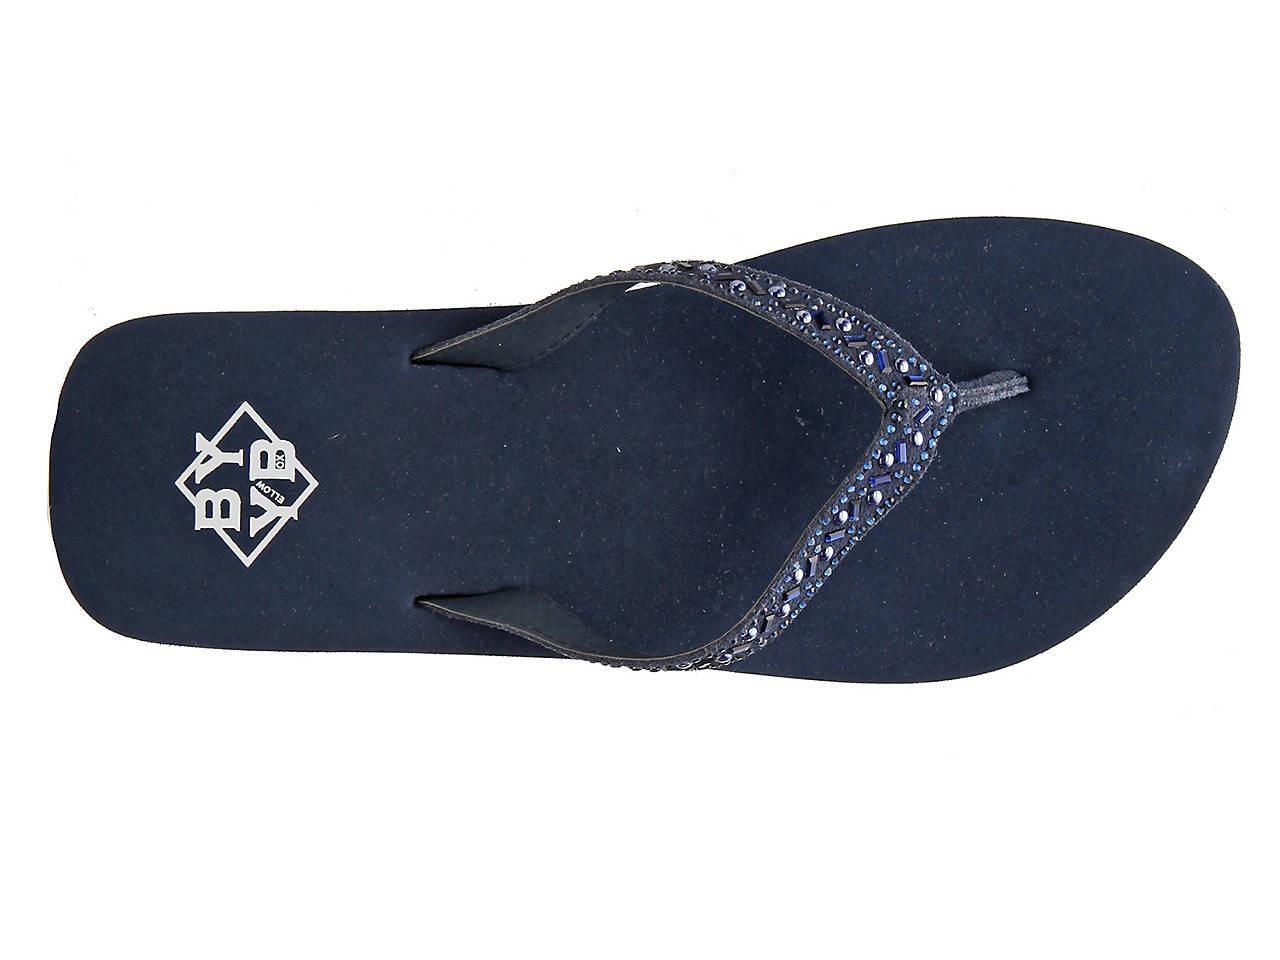 e01619193e9 BYYB Elara Wedge Flip Flop Women s Shoes